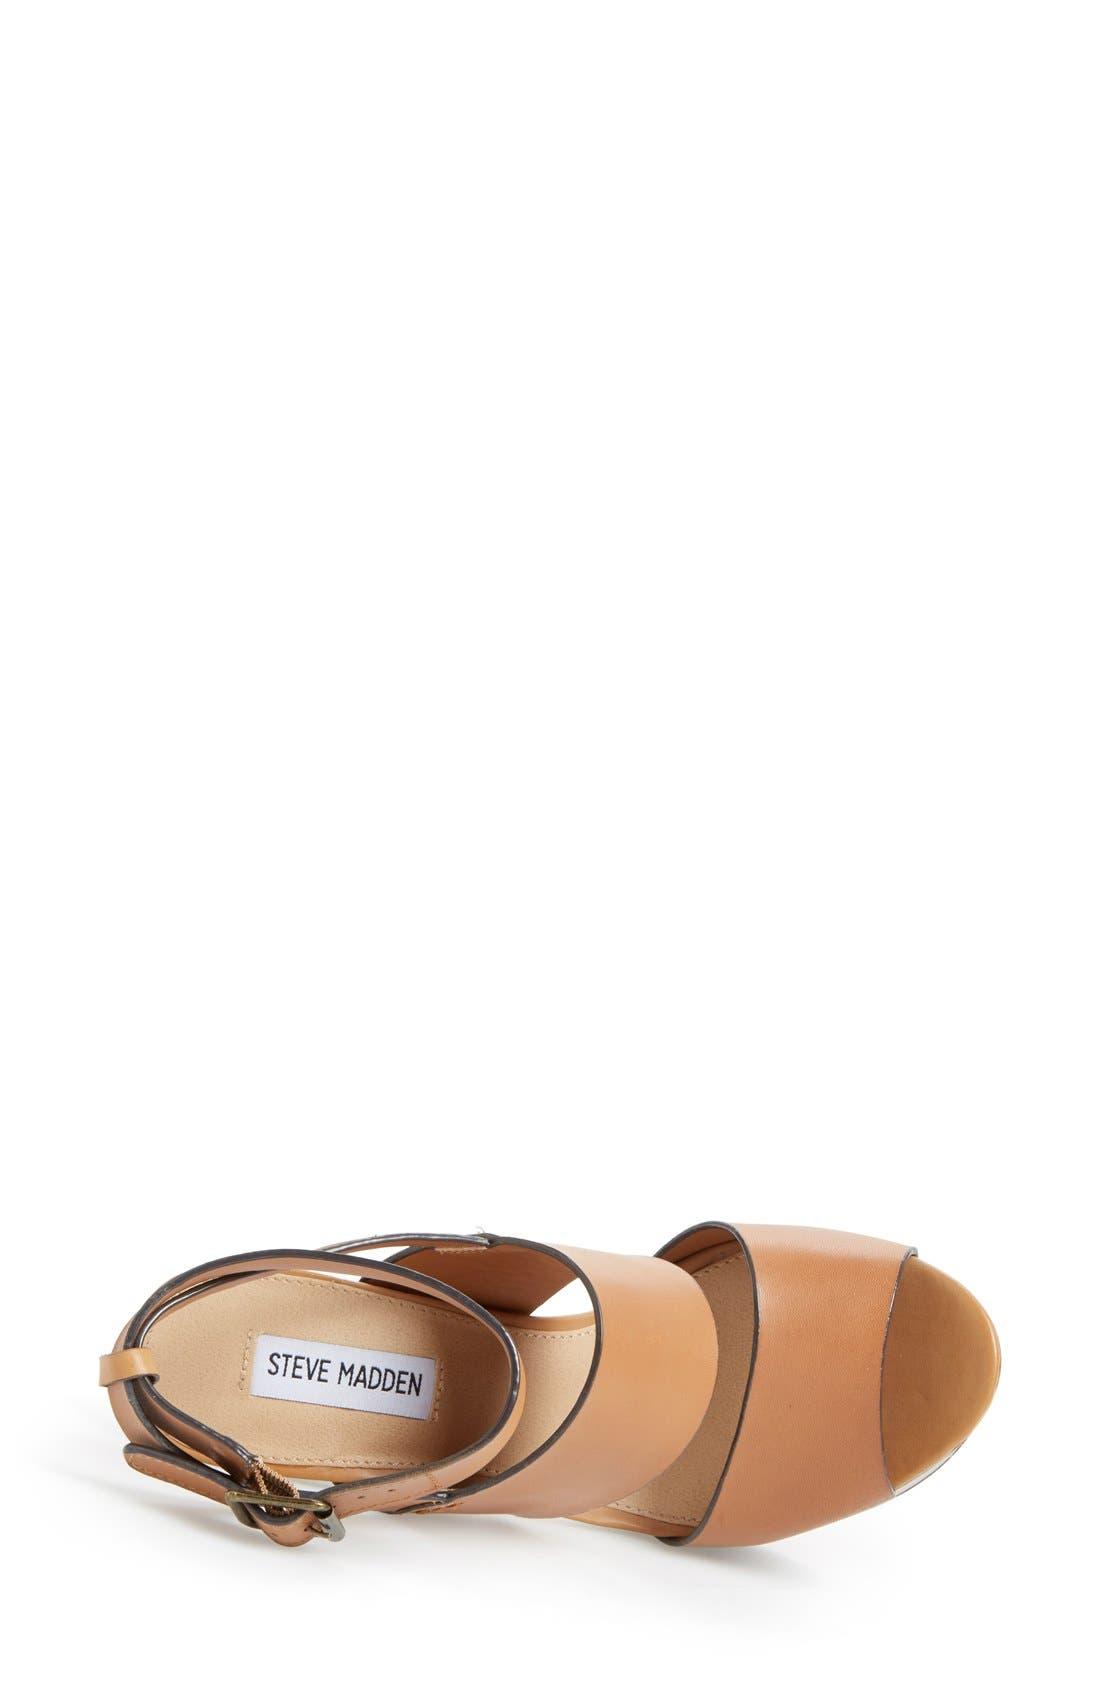 Alternate Image 3  - Steve Madden 'Dezzzy' Leather Ankle Strap Sandal (Women)